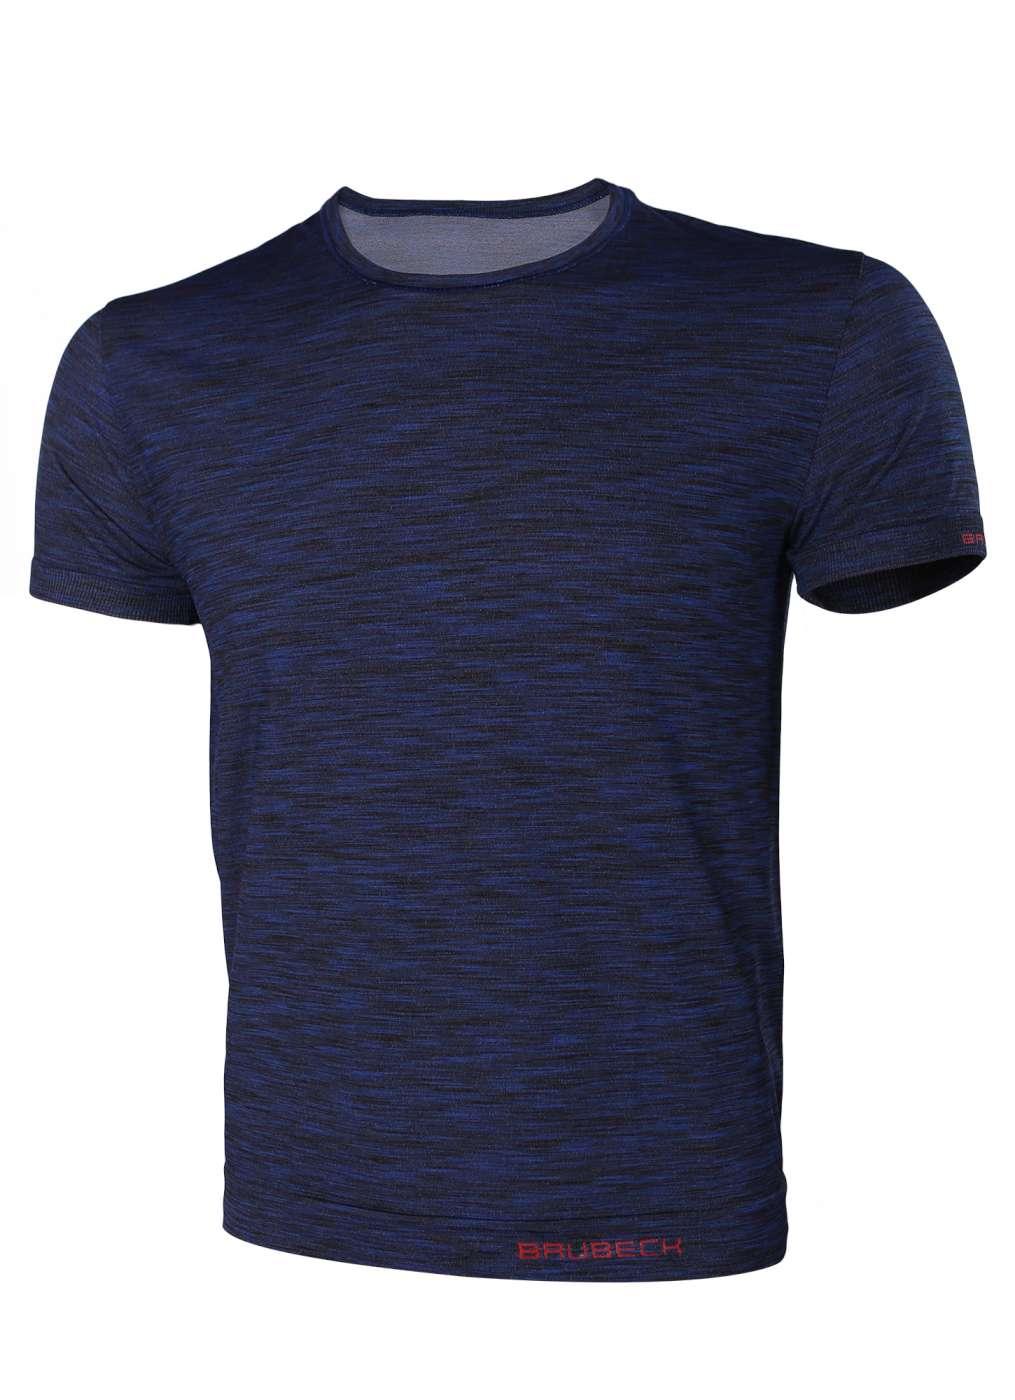 9063aa13f Funkčná bielizeň Brubeck Fusion pánske tričko krátky rukáv